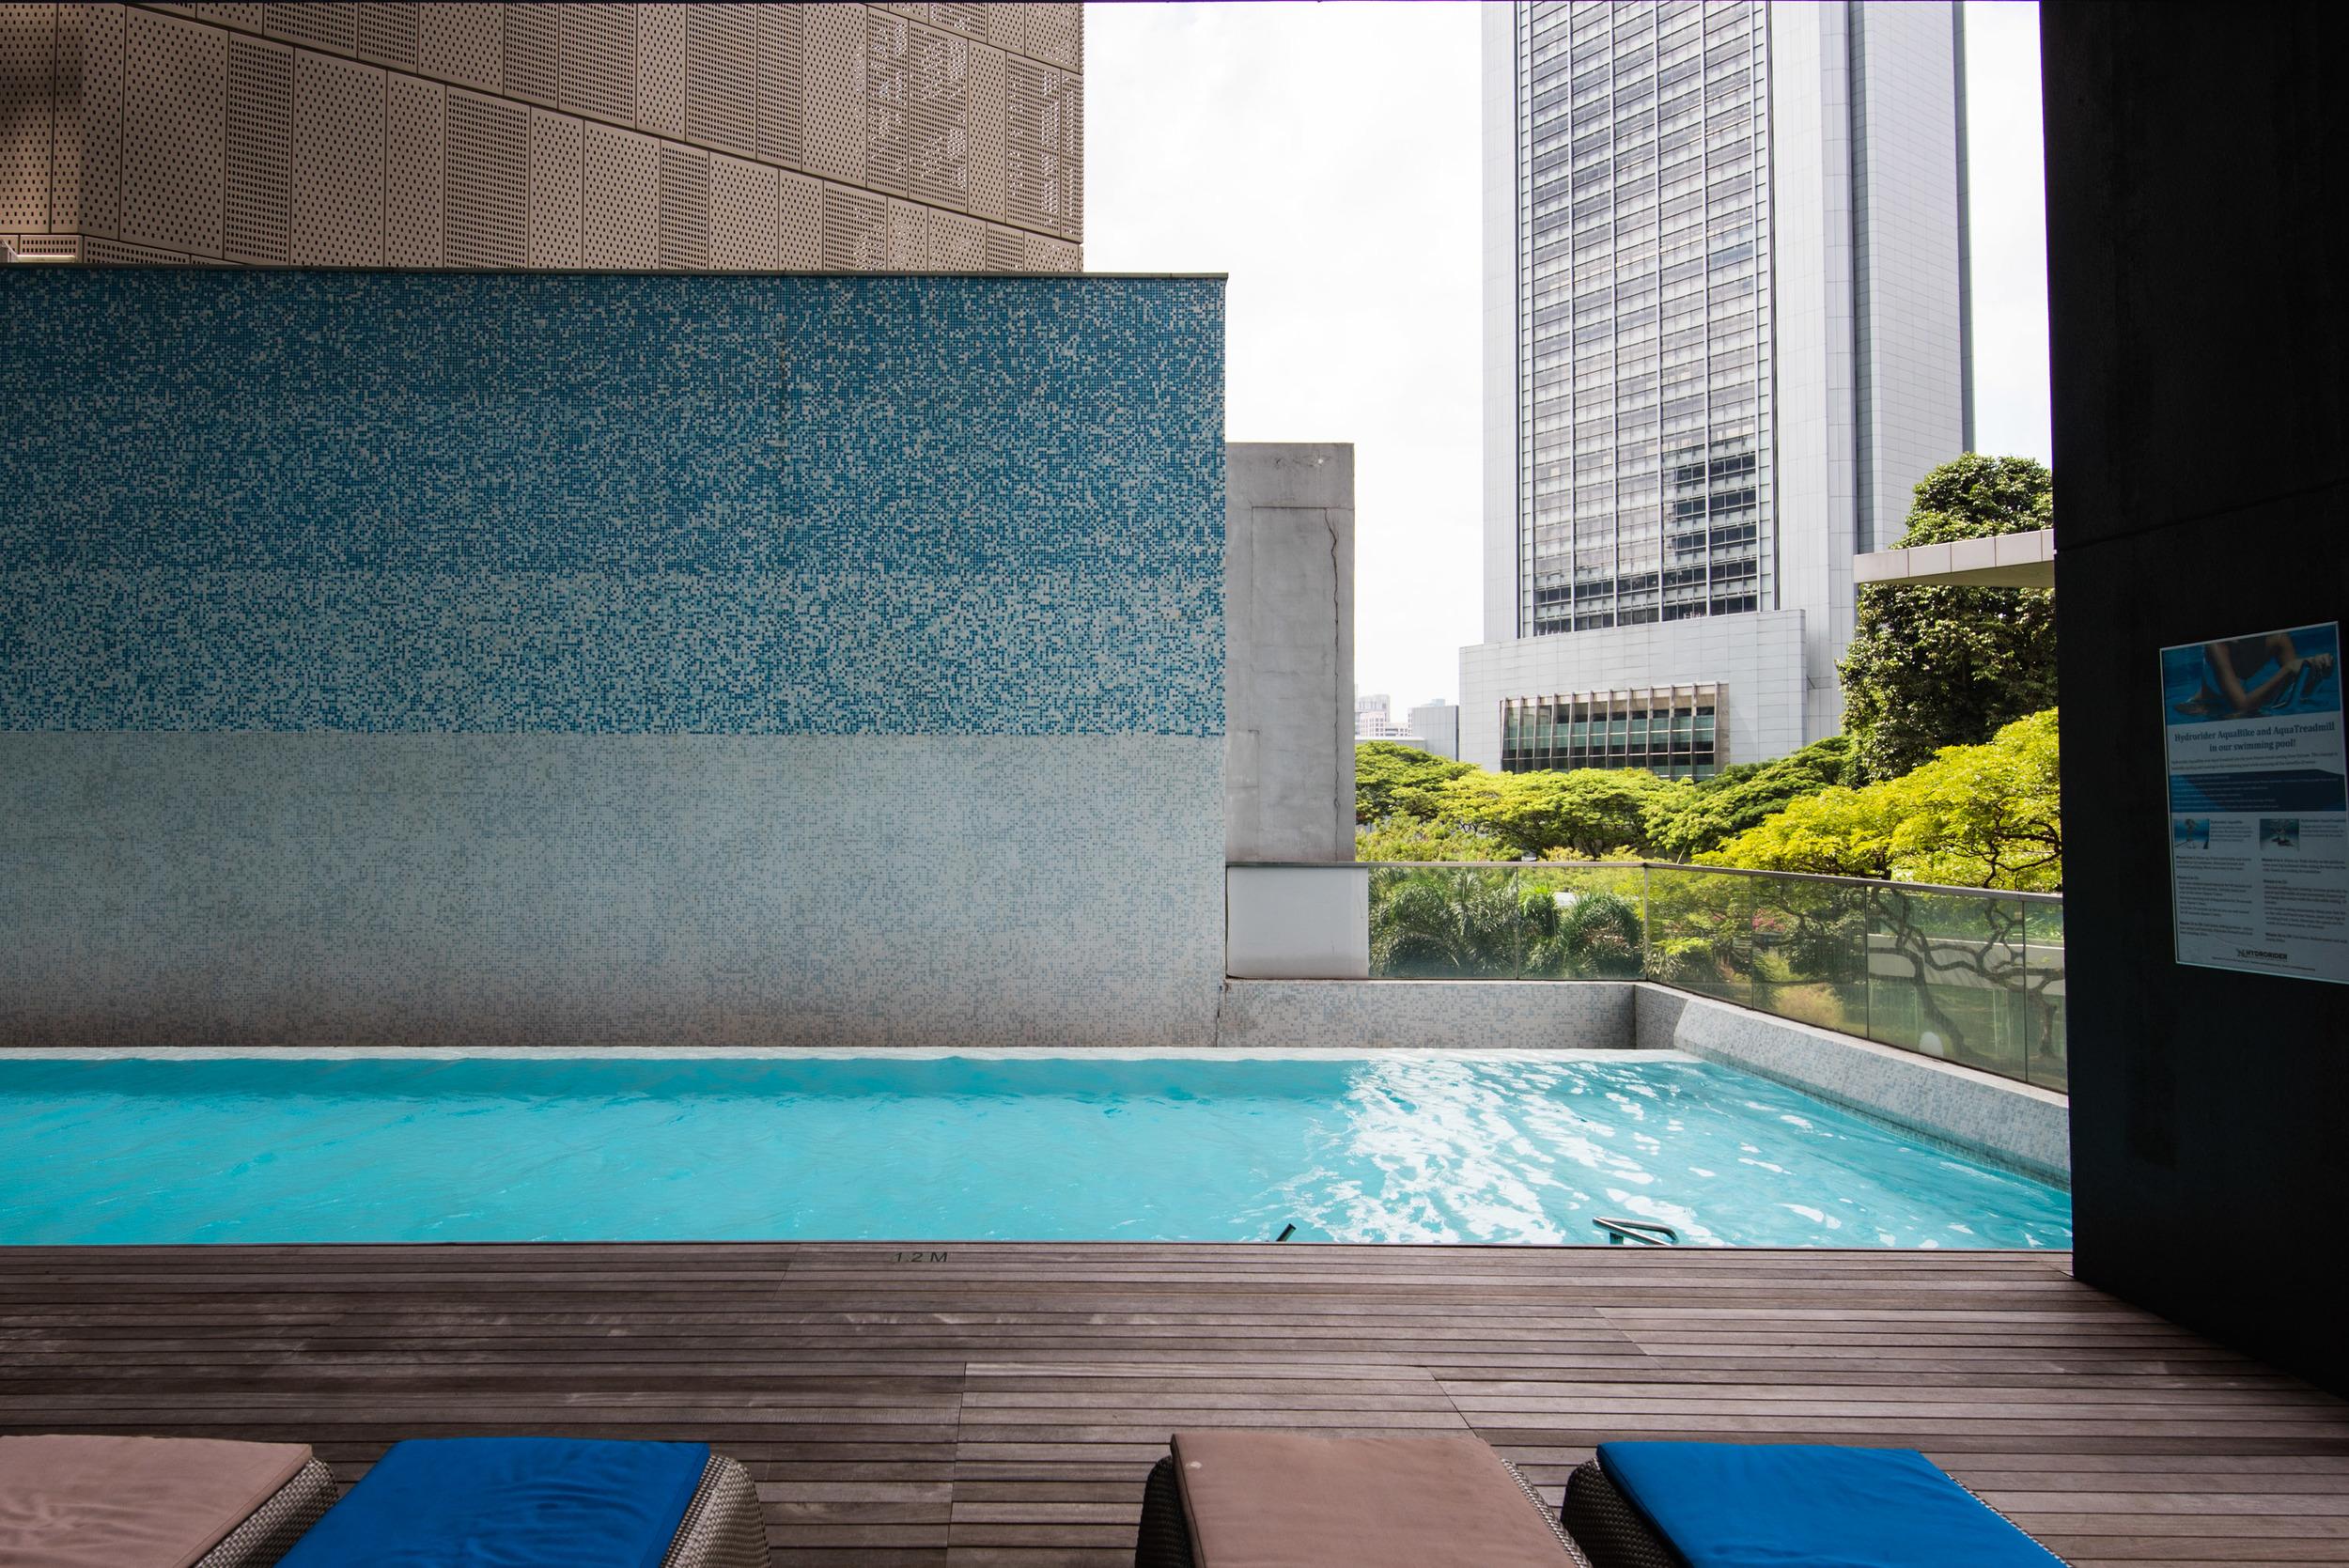 Ionized Water Swimming Pool